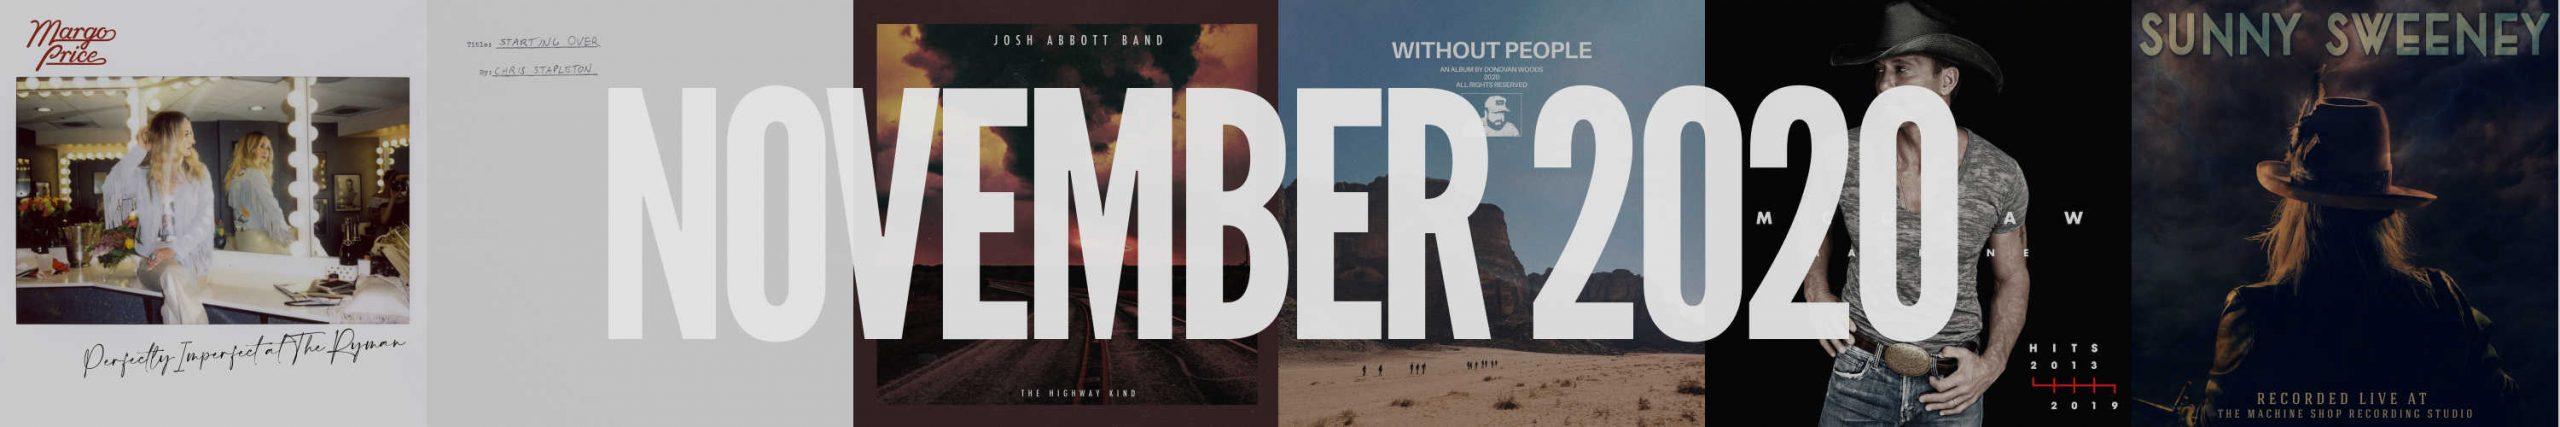 November 2020 New Country Album Releases